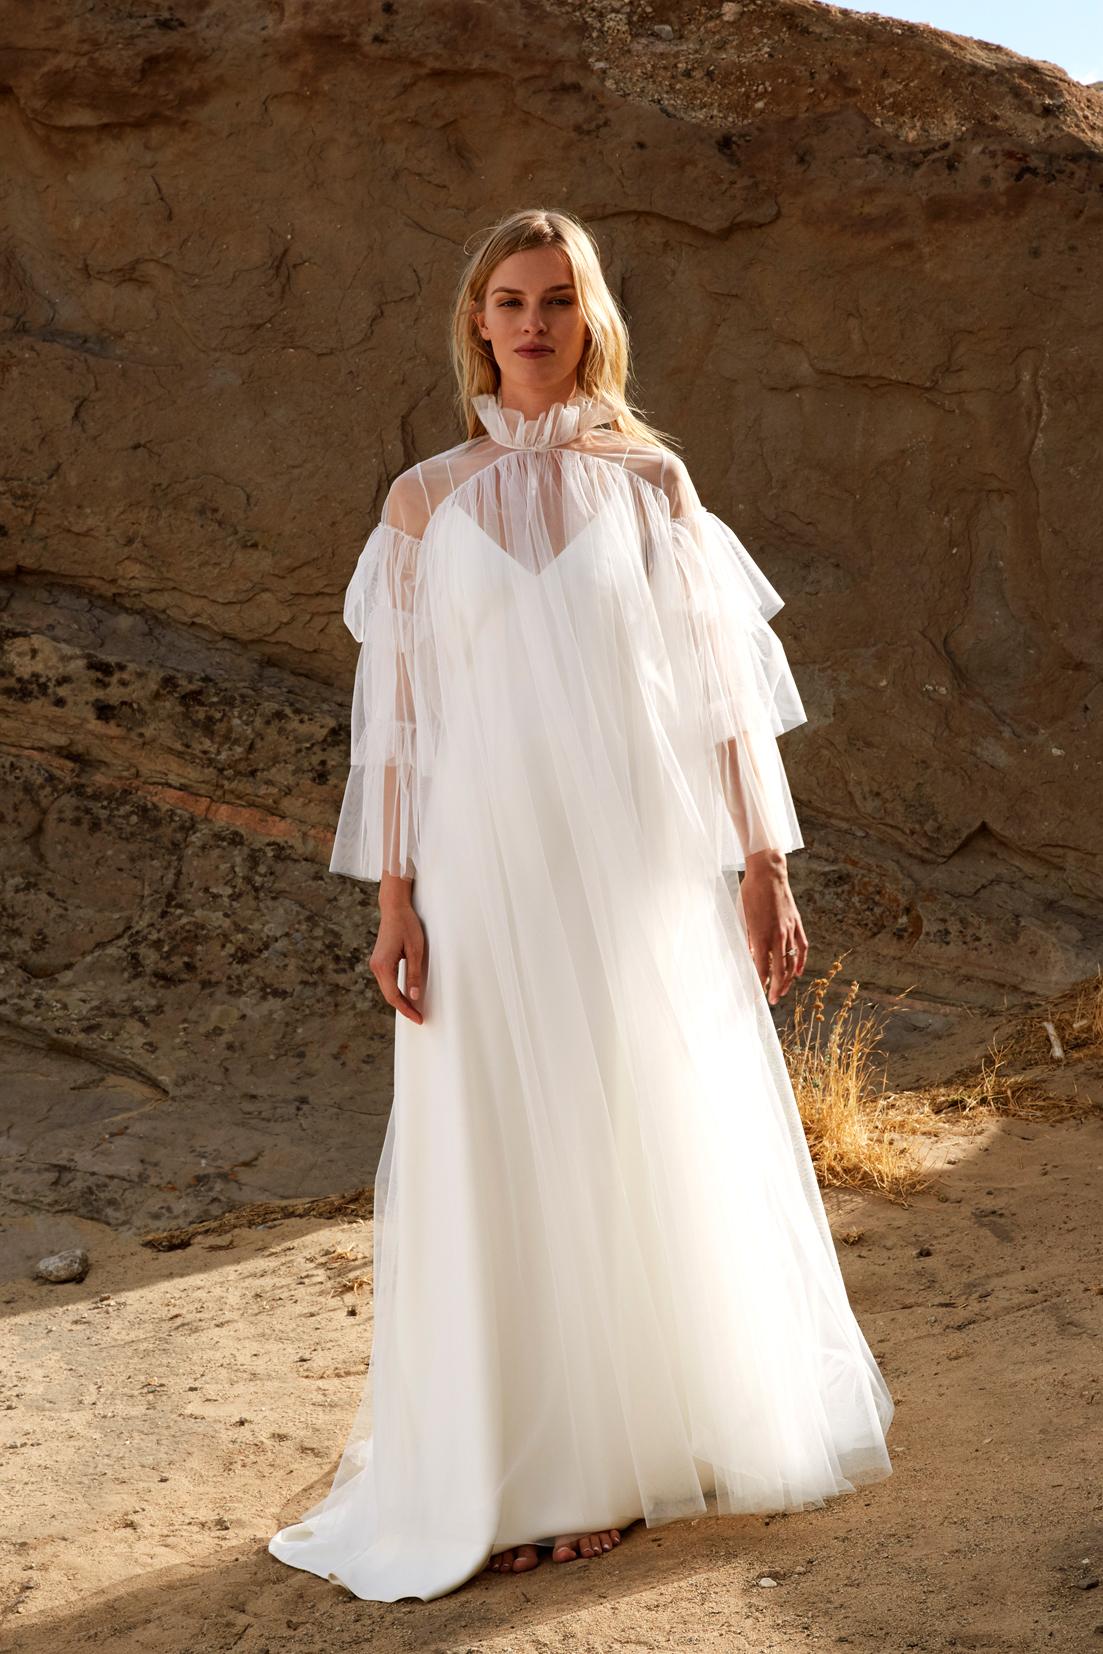 savannah miller fall 2018 high collar chiffon overlay wedding dress